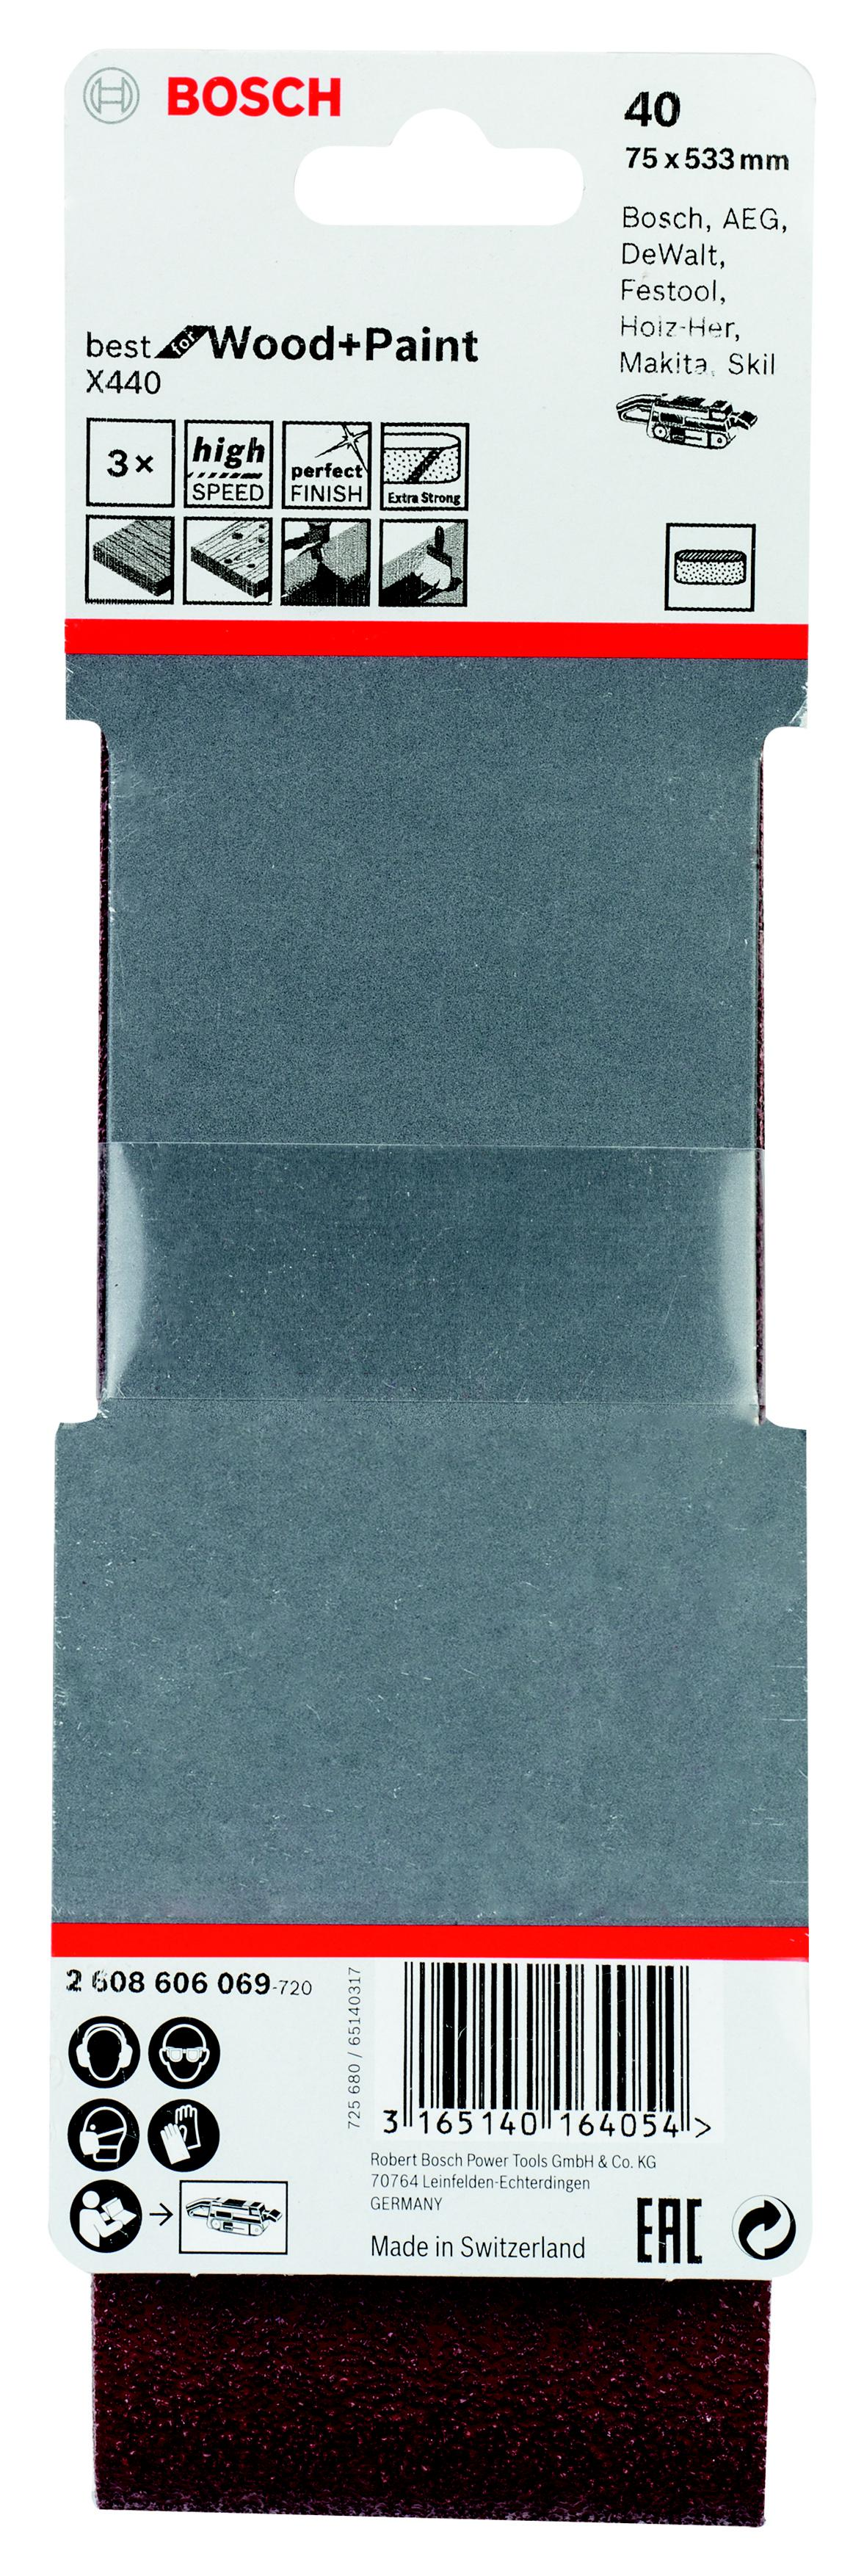 Лента шлиф. бесконечная Bosch 75х533мм p40 smc type mgpm40 75 40mm bore 75mm stroke pneumatic guided cylinder compact guide slide bearing mgpm 40 75 40 75 40x75